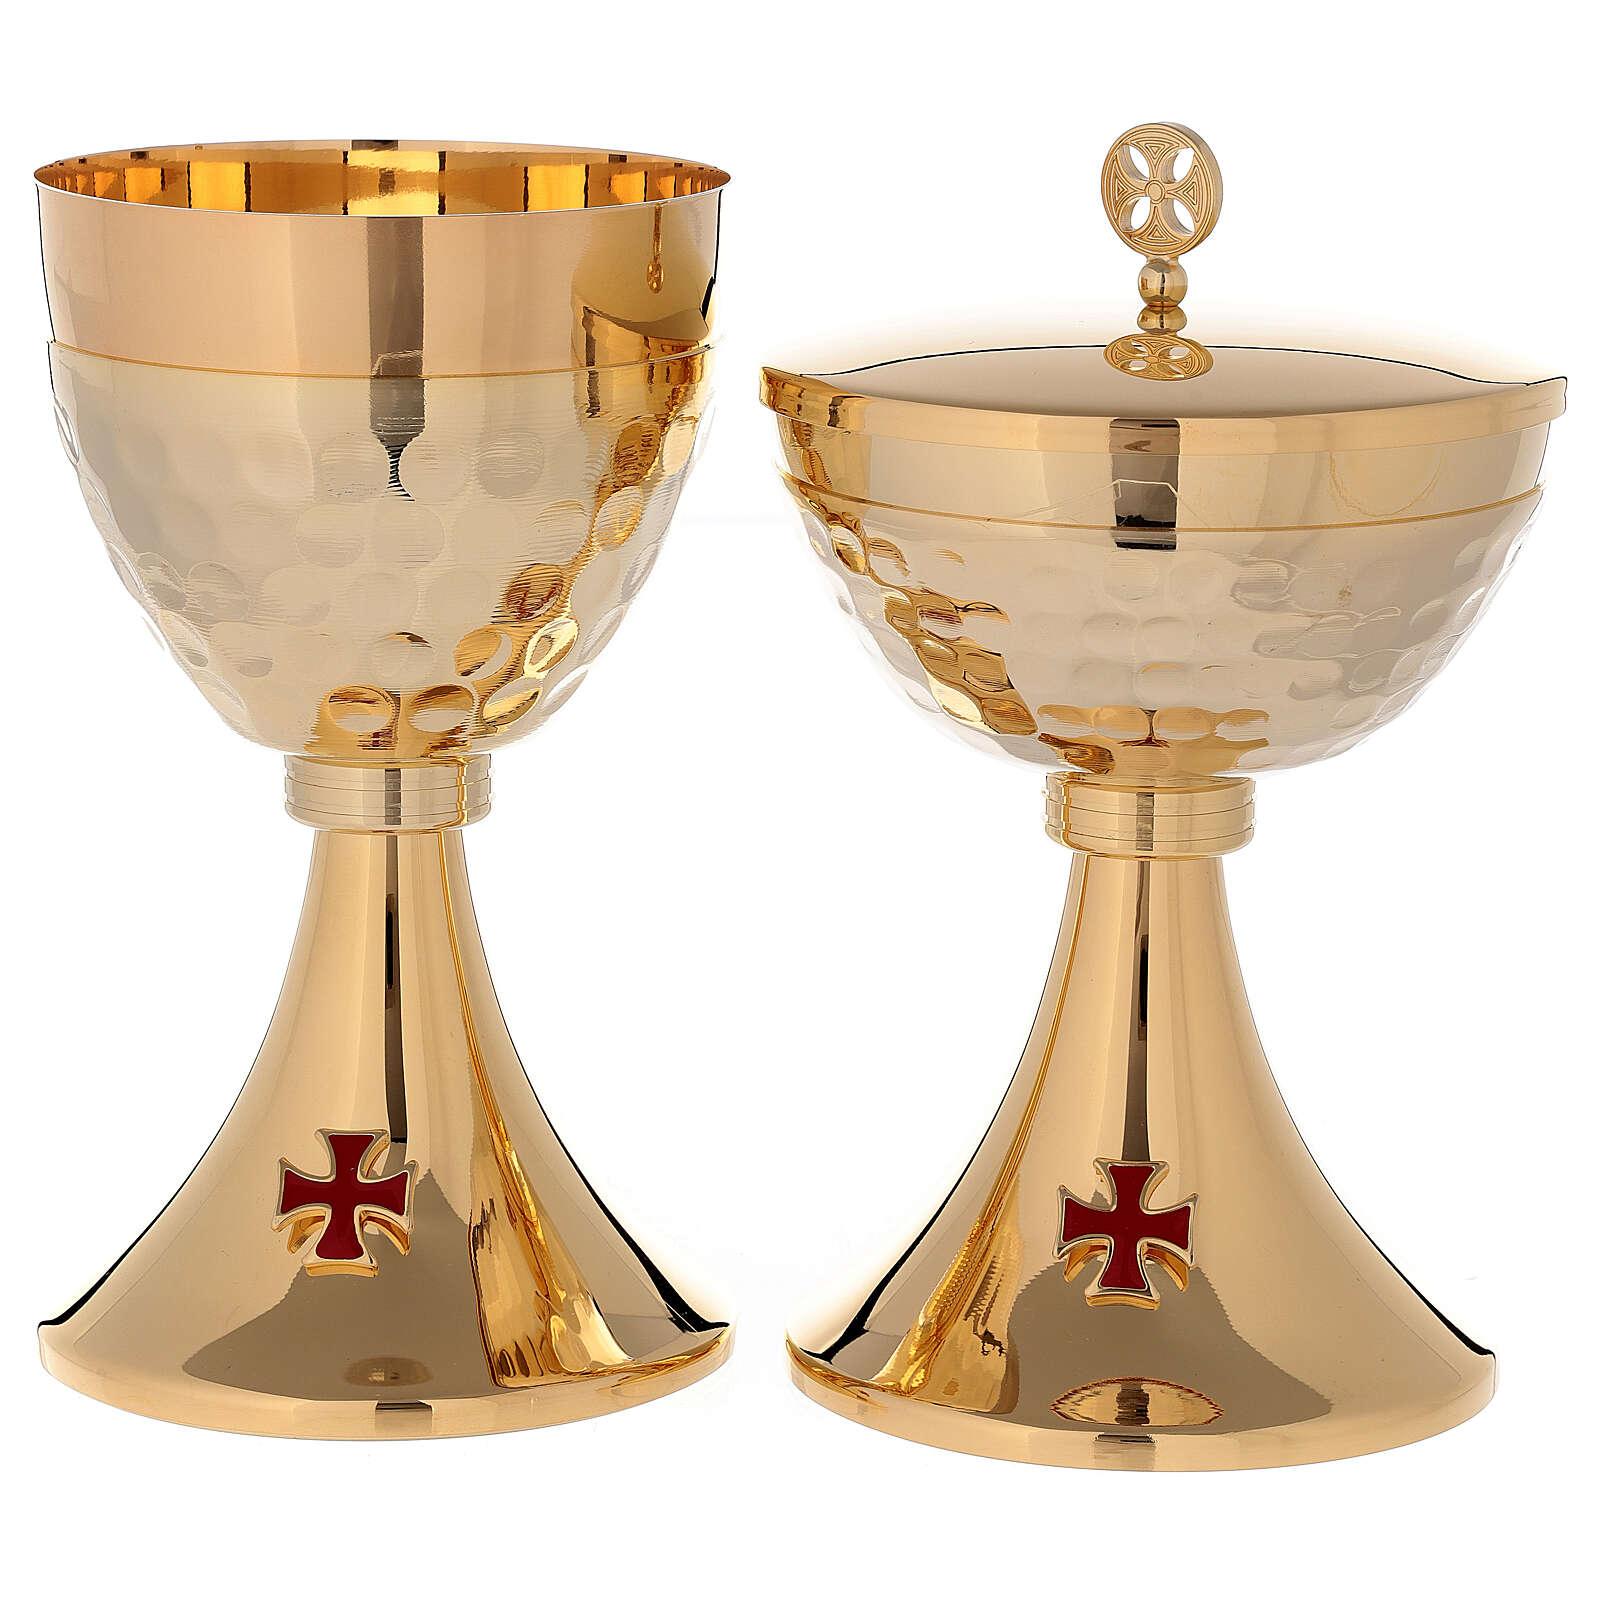 Cáliz Copón latón dorado 24k cruz esmaltada base de la copa martillada 4